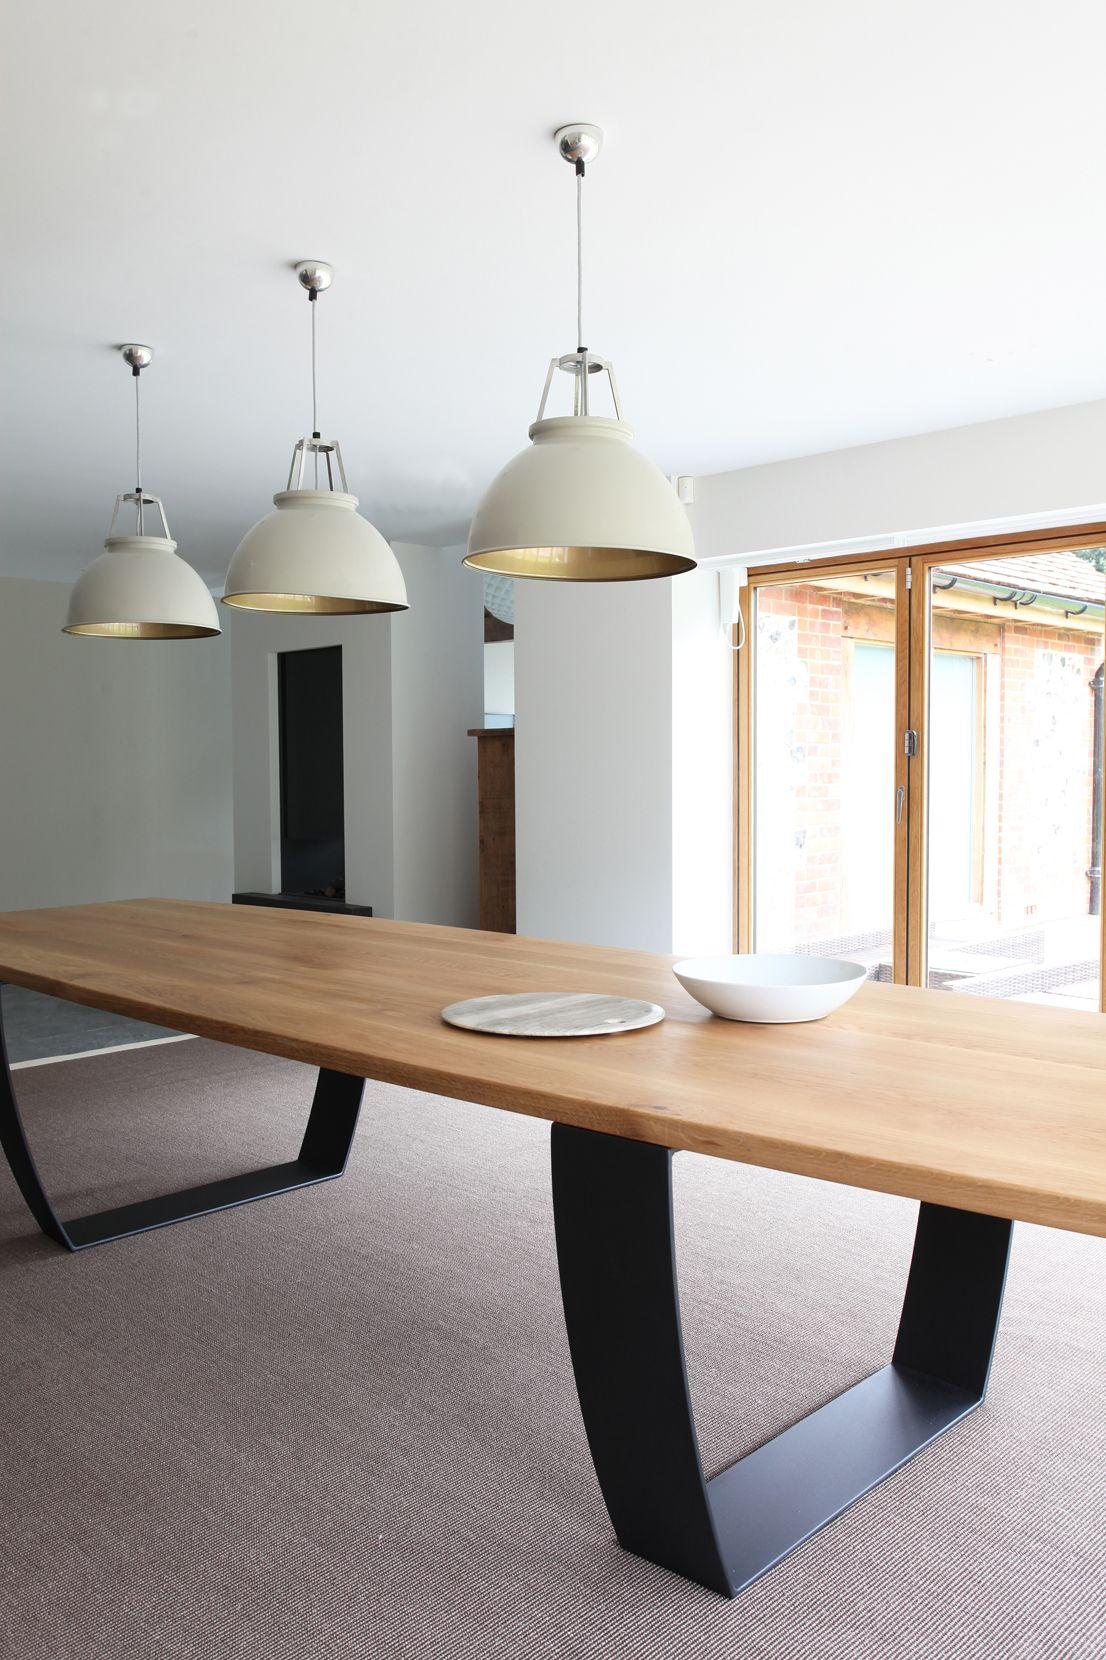 Concrete Kitchen Table Modern Kitchens Pictures Oak Steel Dining Design By Timber Trepazariski Masi Od